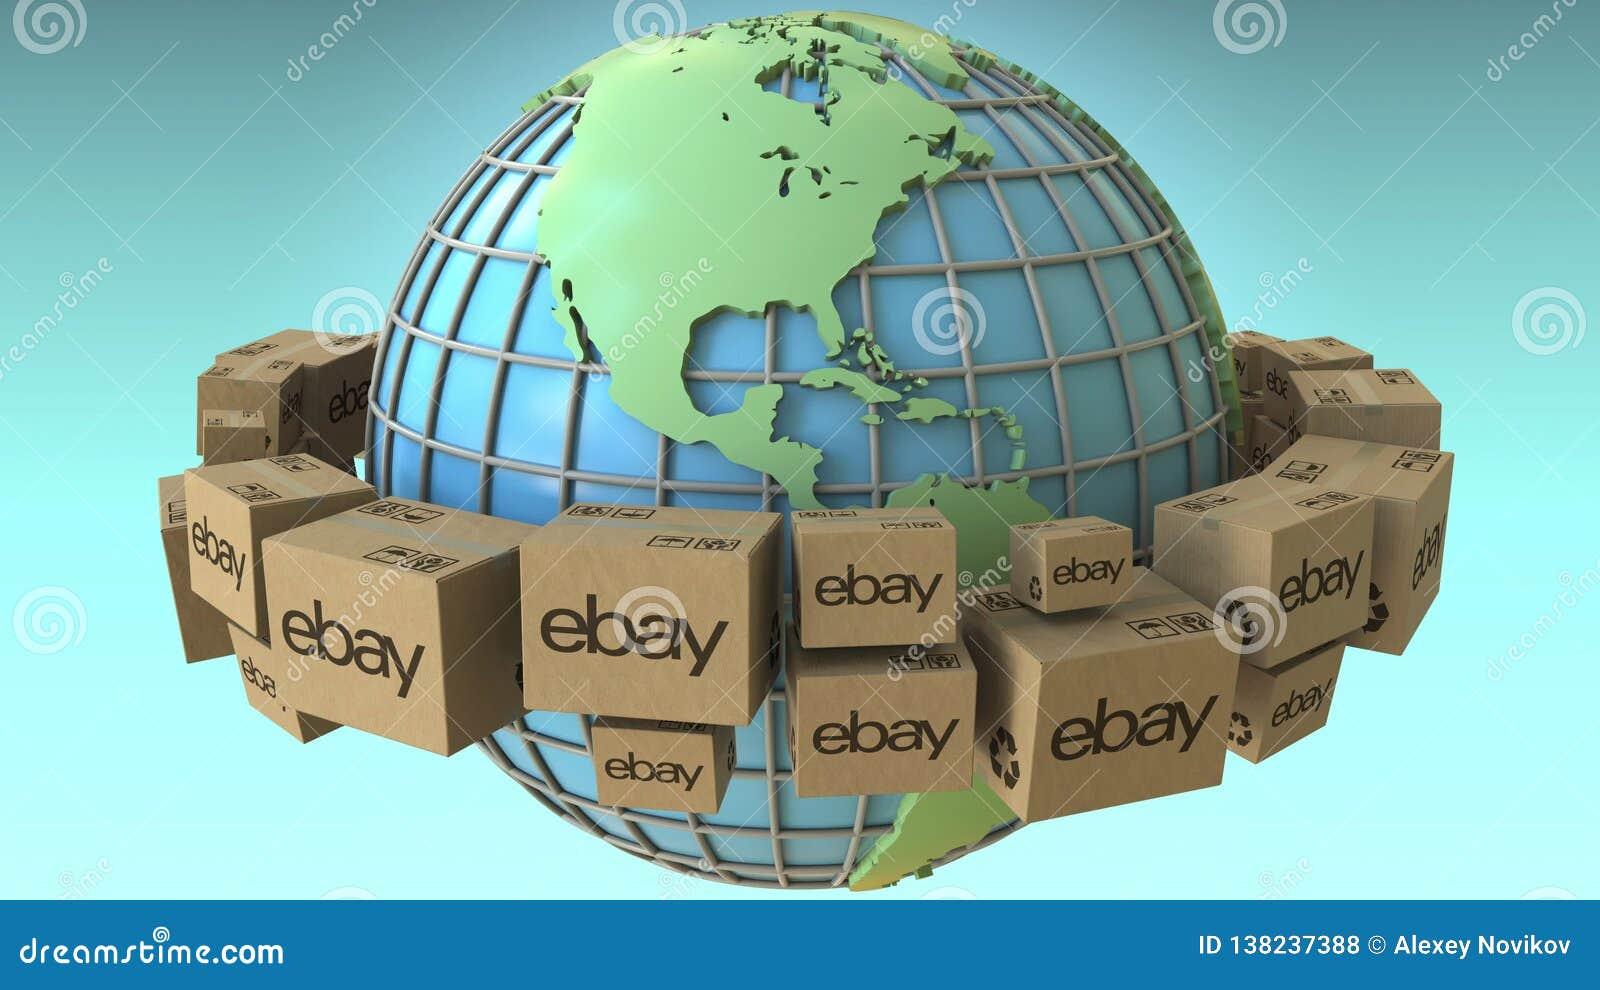 Map Of America Ebay.Boxes With Ebay Logo Around The World America Emphasized